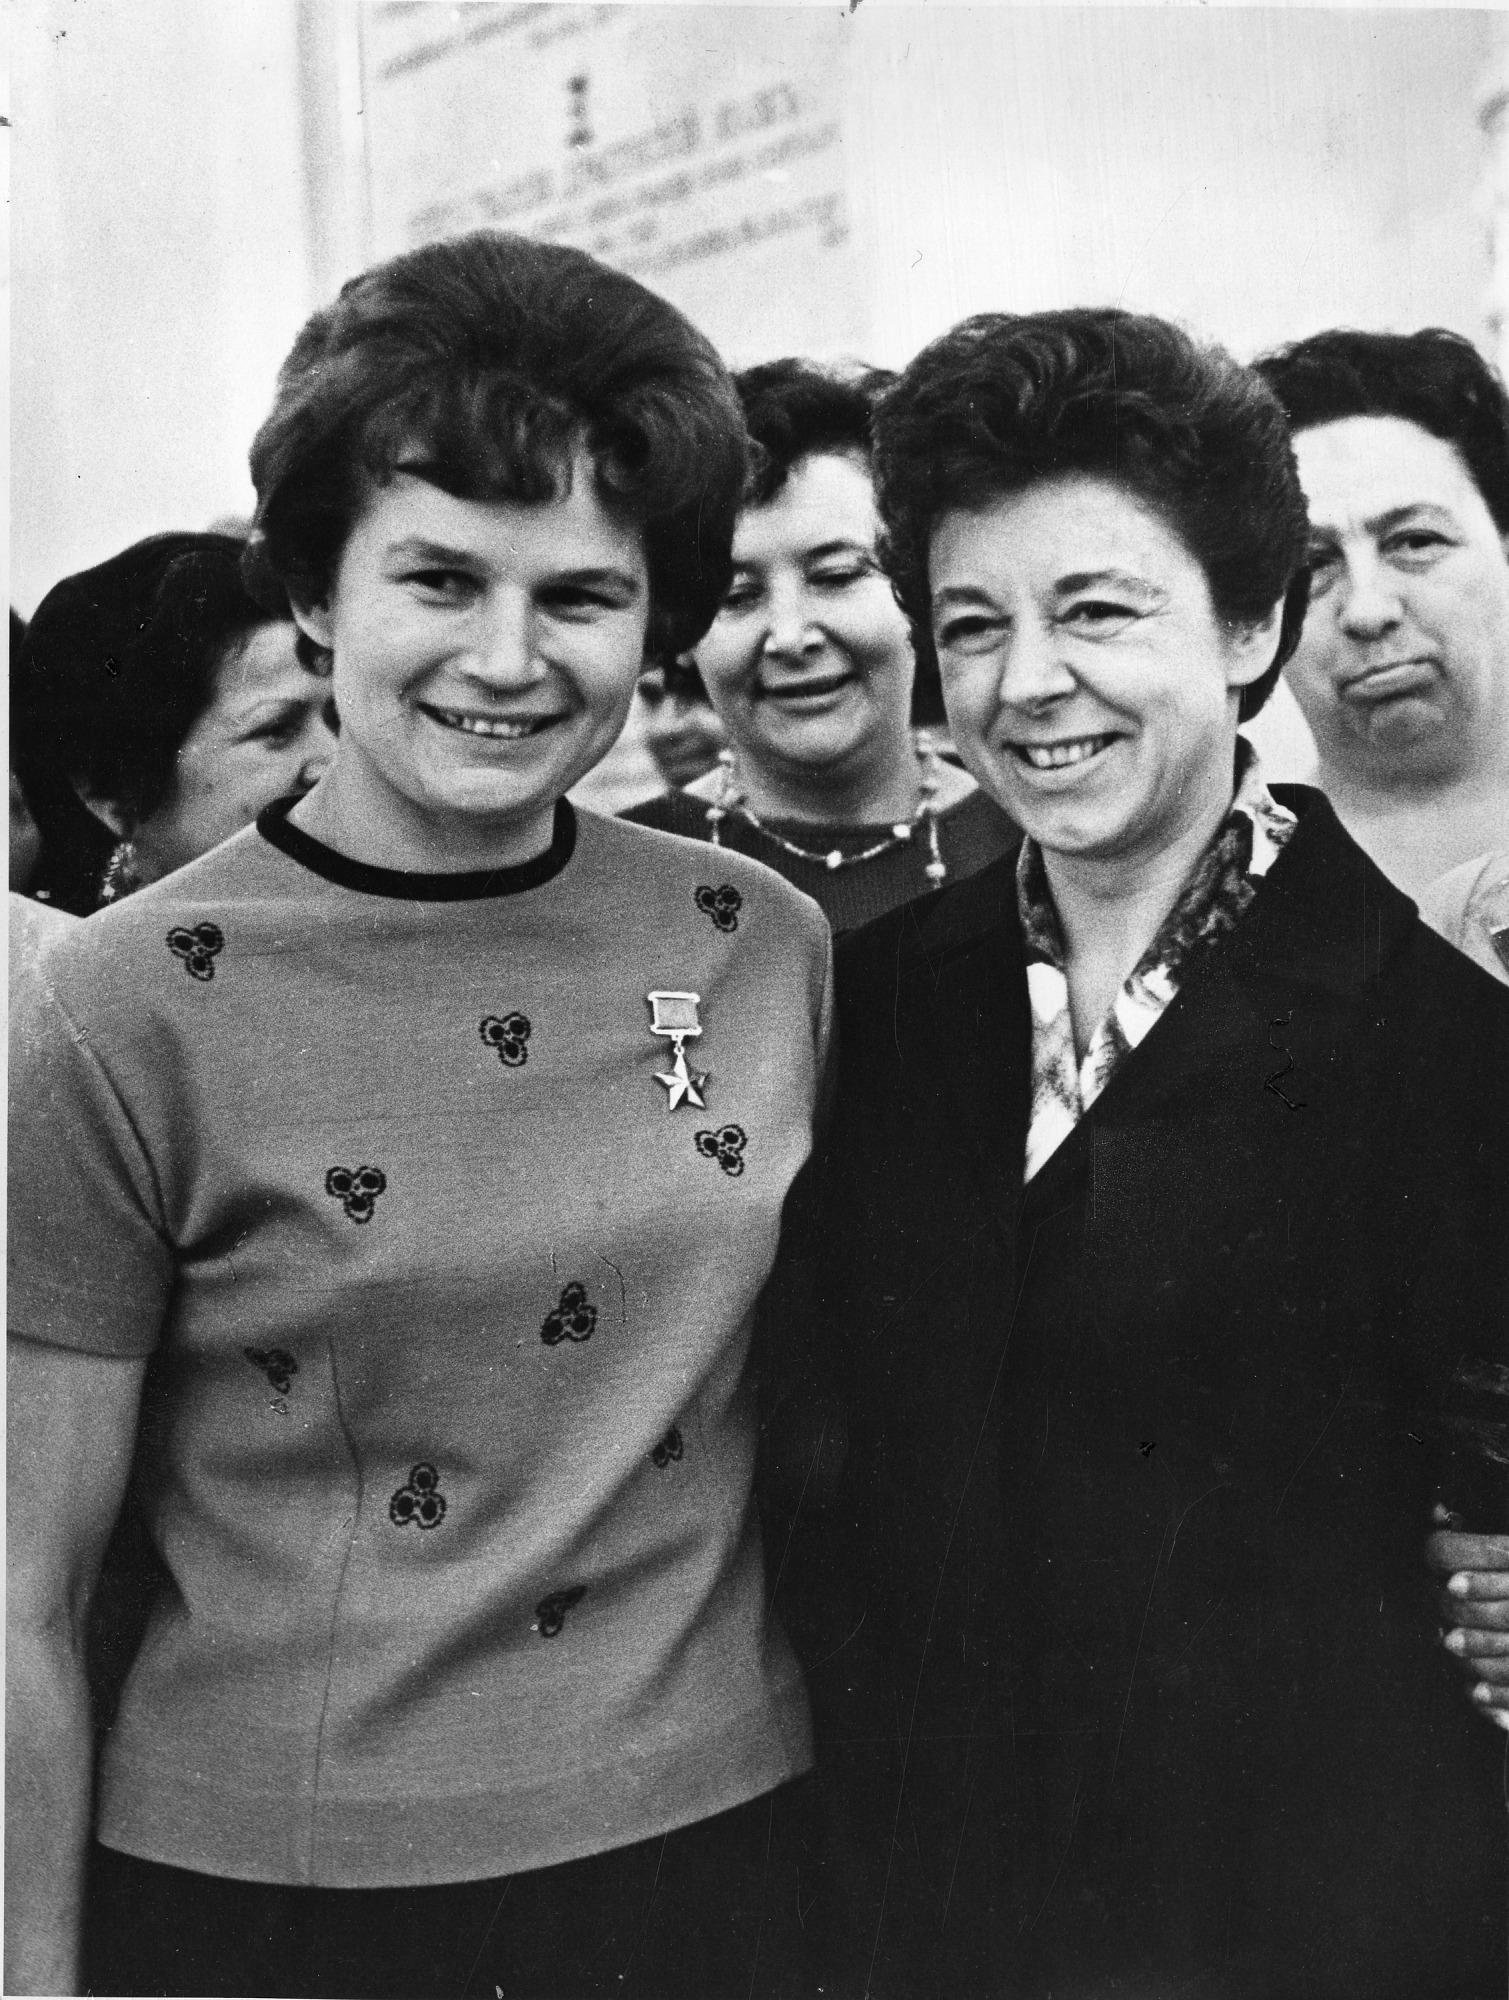 Valentina Vladimirovna Nikolayeva-Tereshkova (b. 1937) and unidentified woman